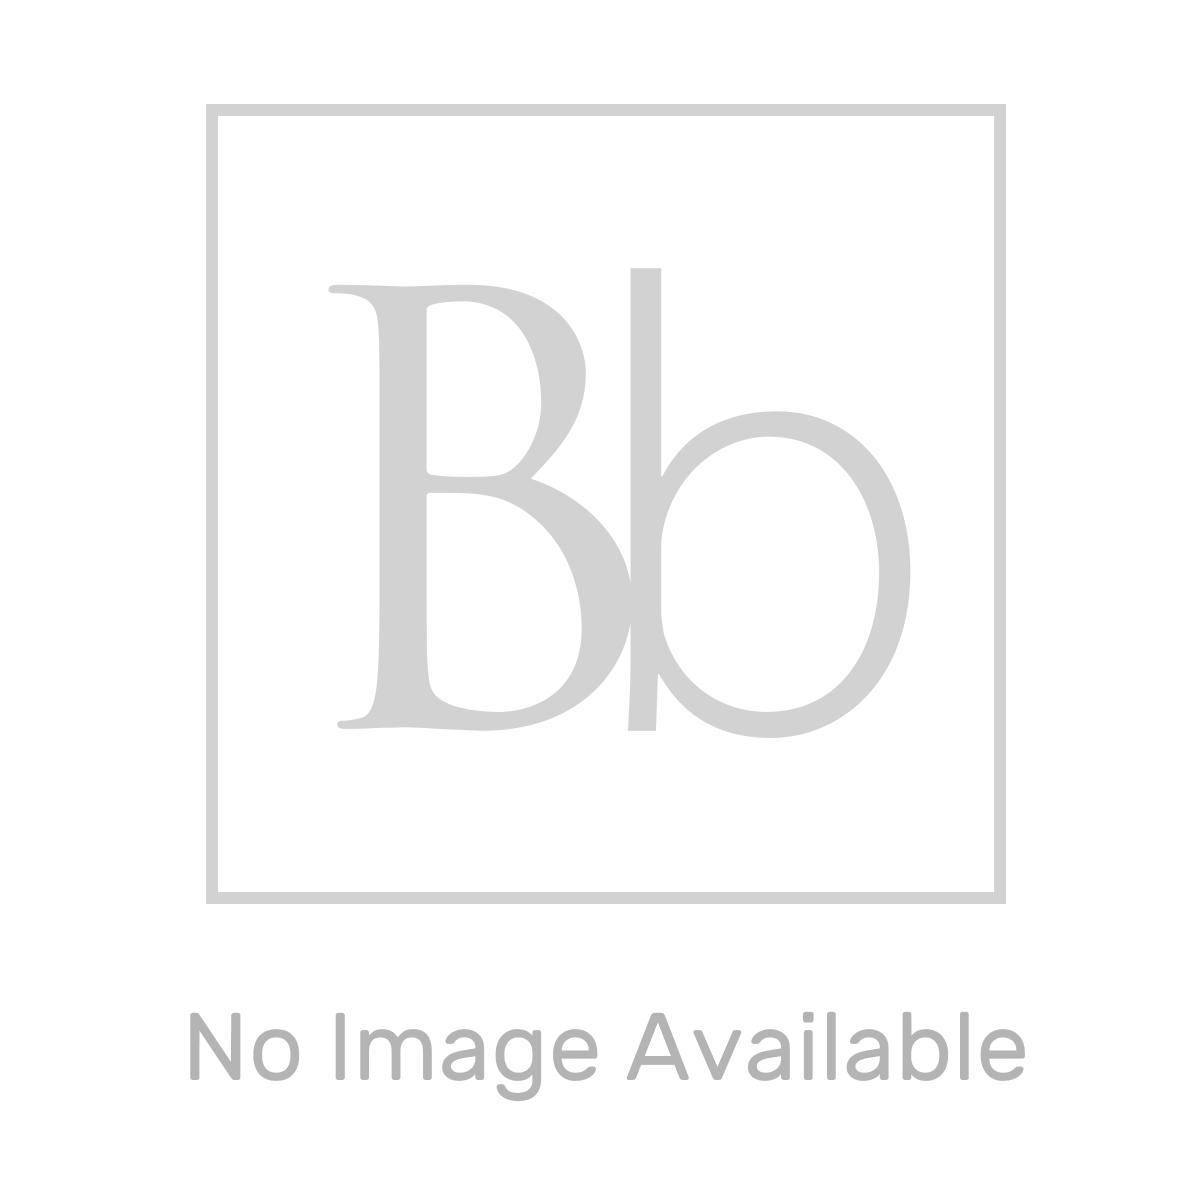 York White Ash Bath Panel 1800mm